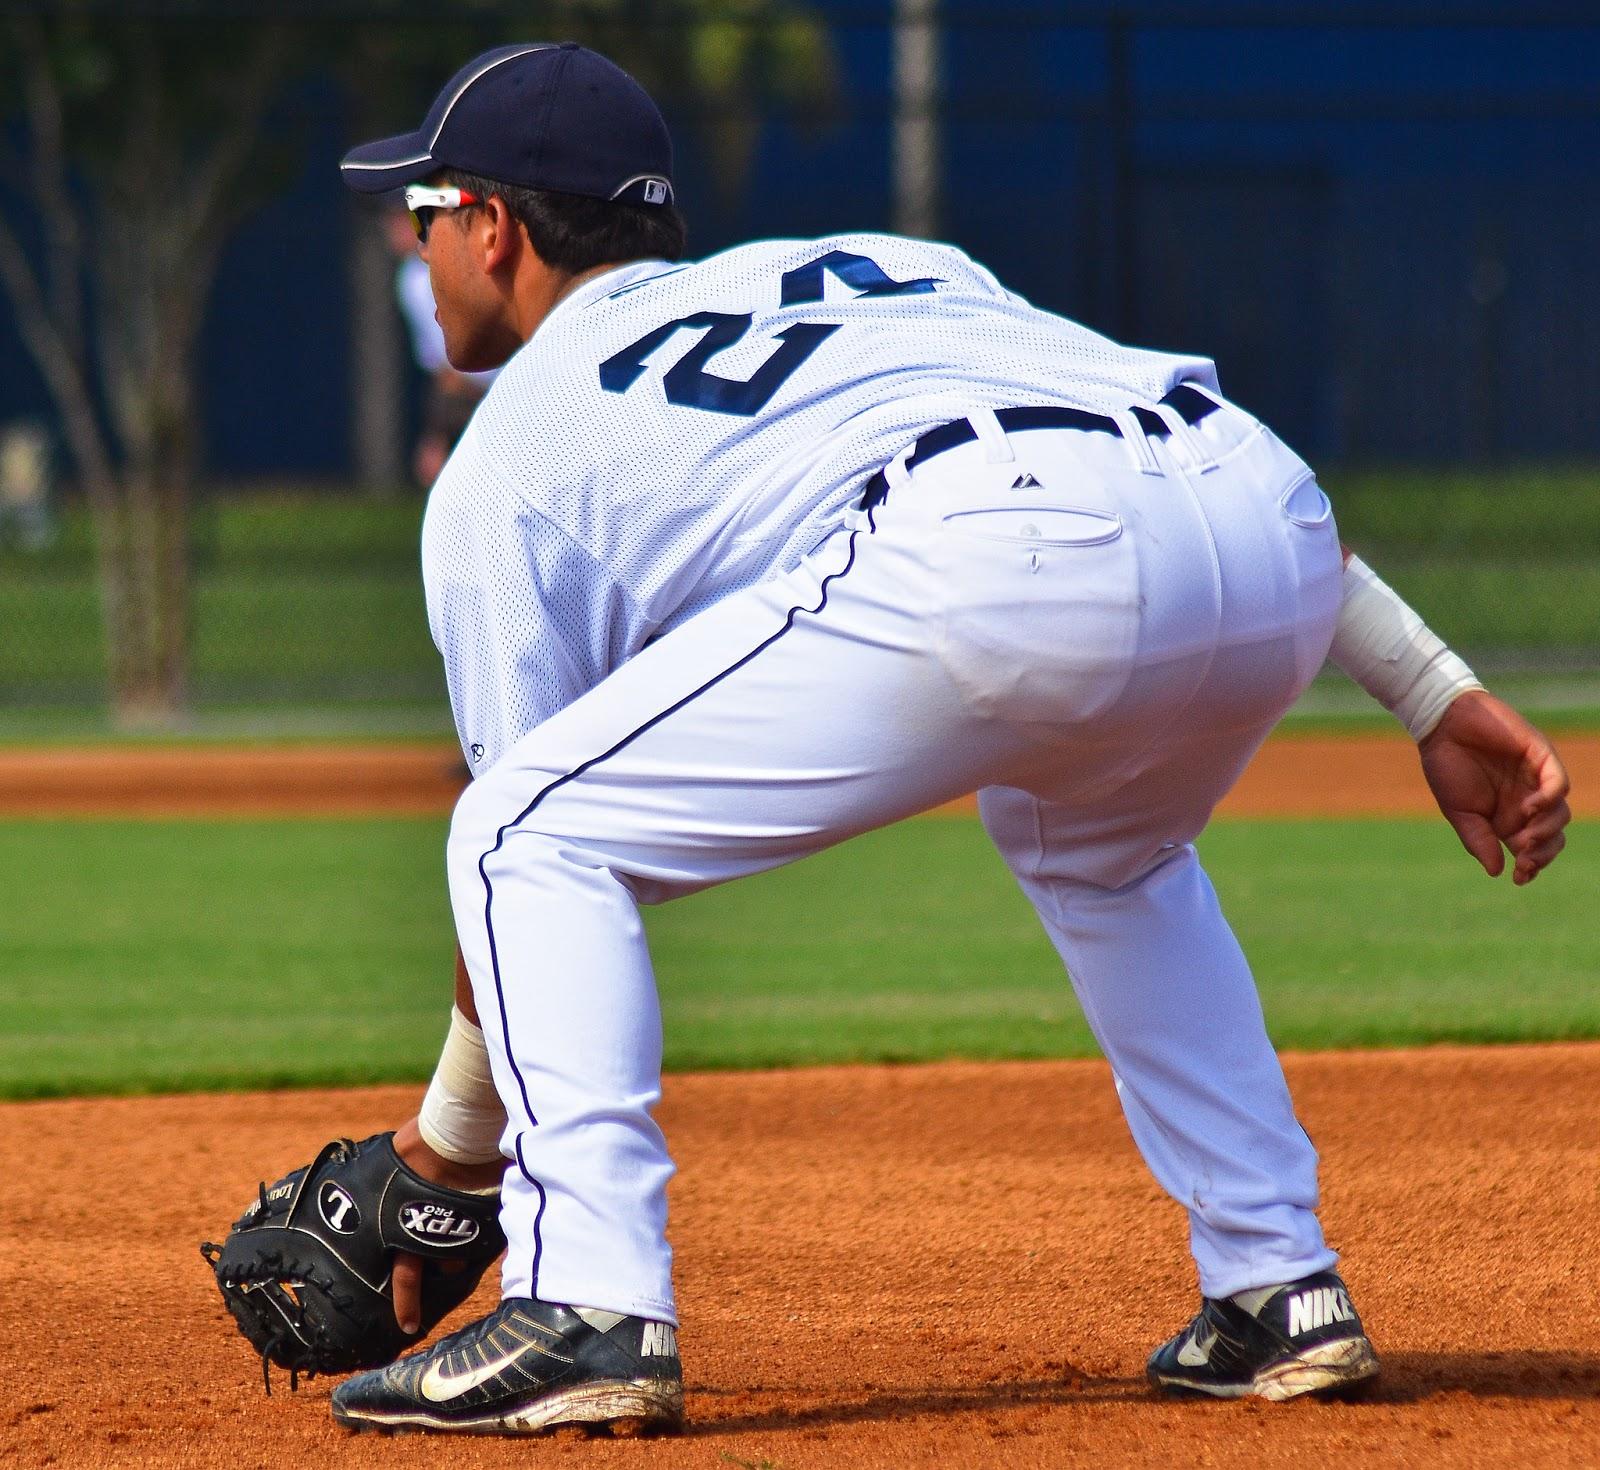 Hot Guys Nude: Baseball Players Bulges